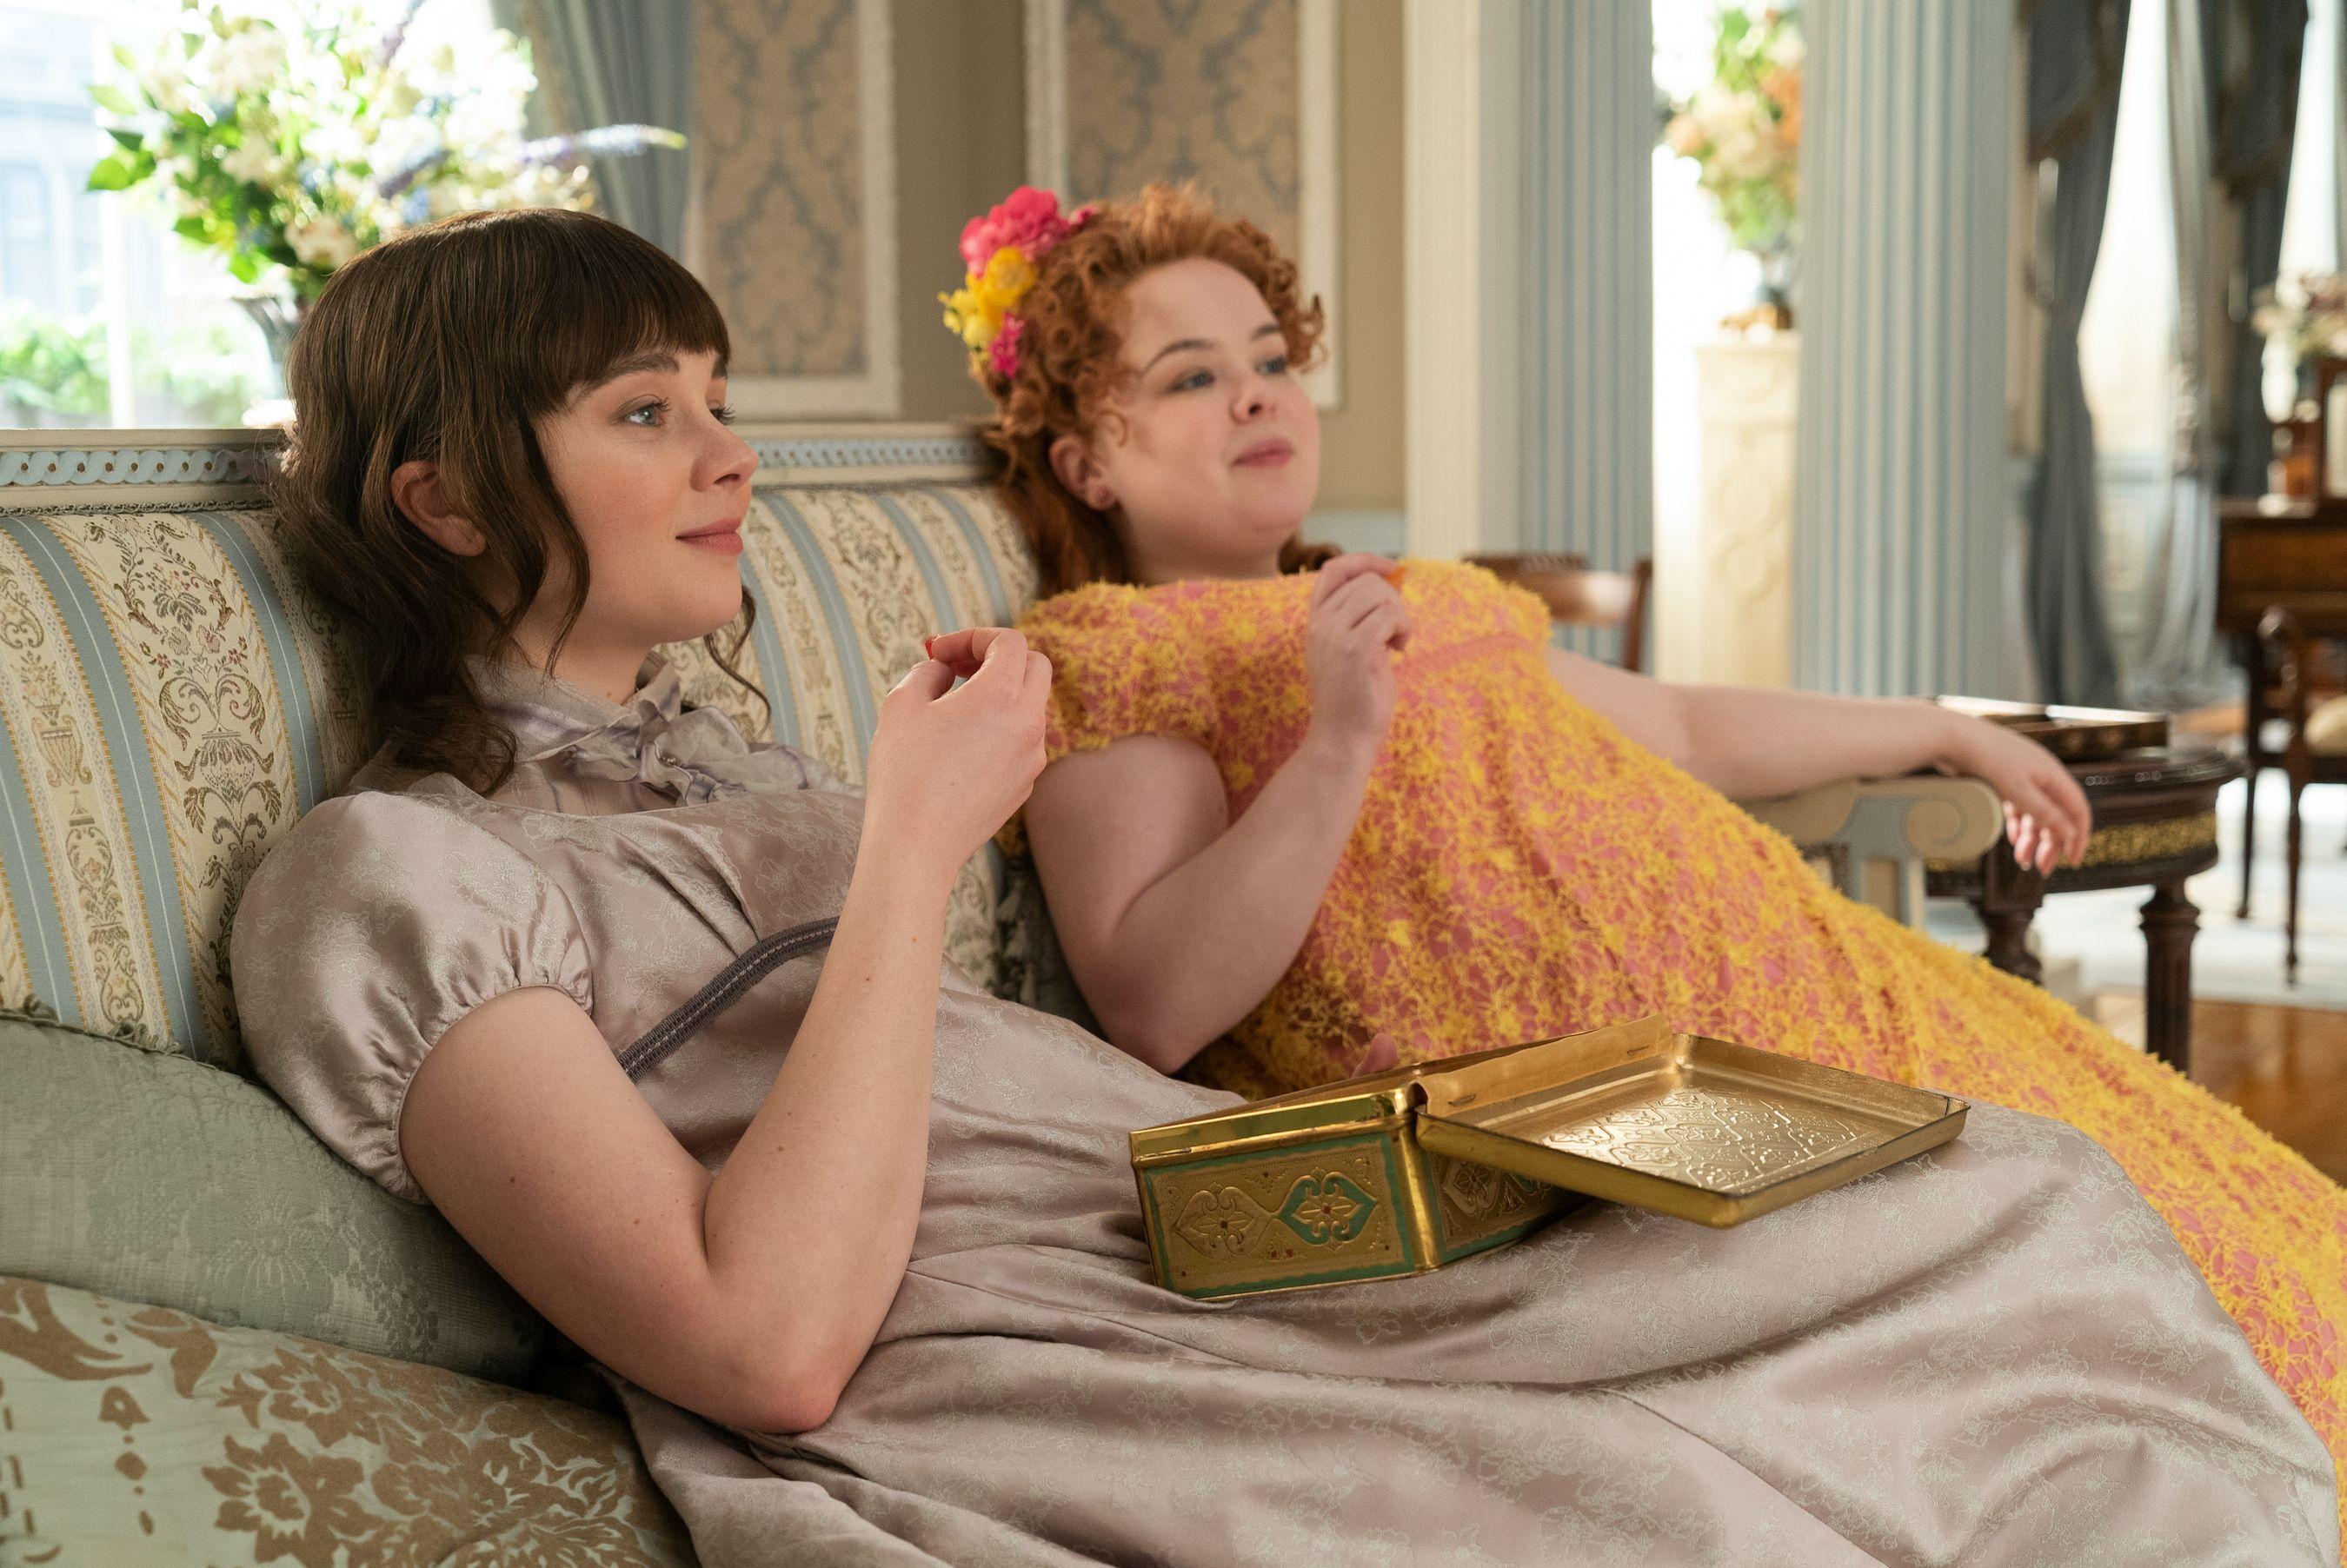 13 Shows Like 'Bridgerton' | What to Watch After 'Bridgerton'